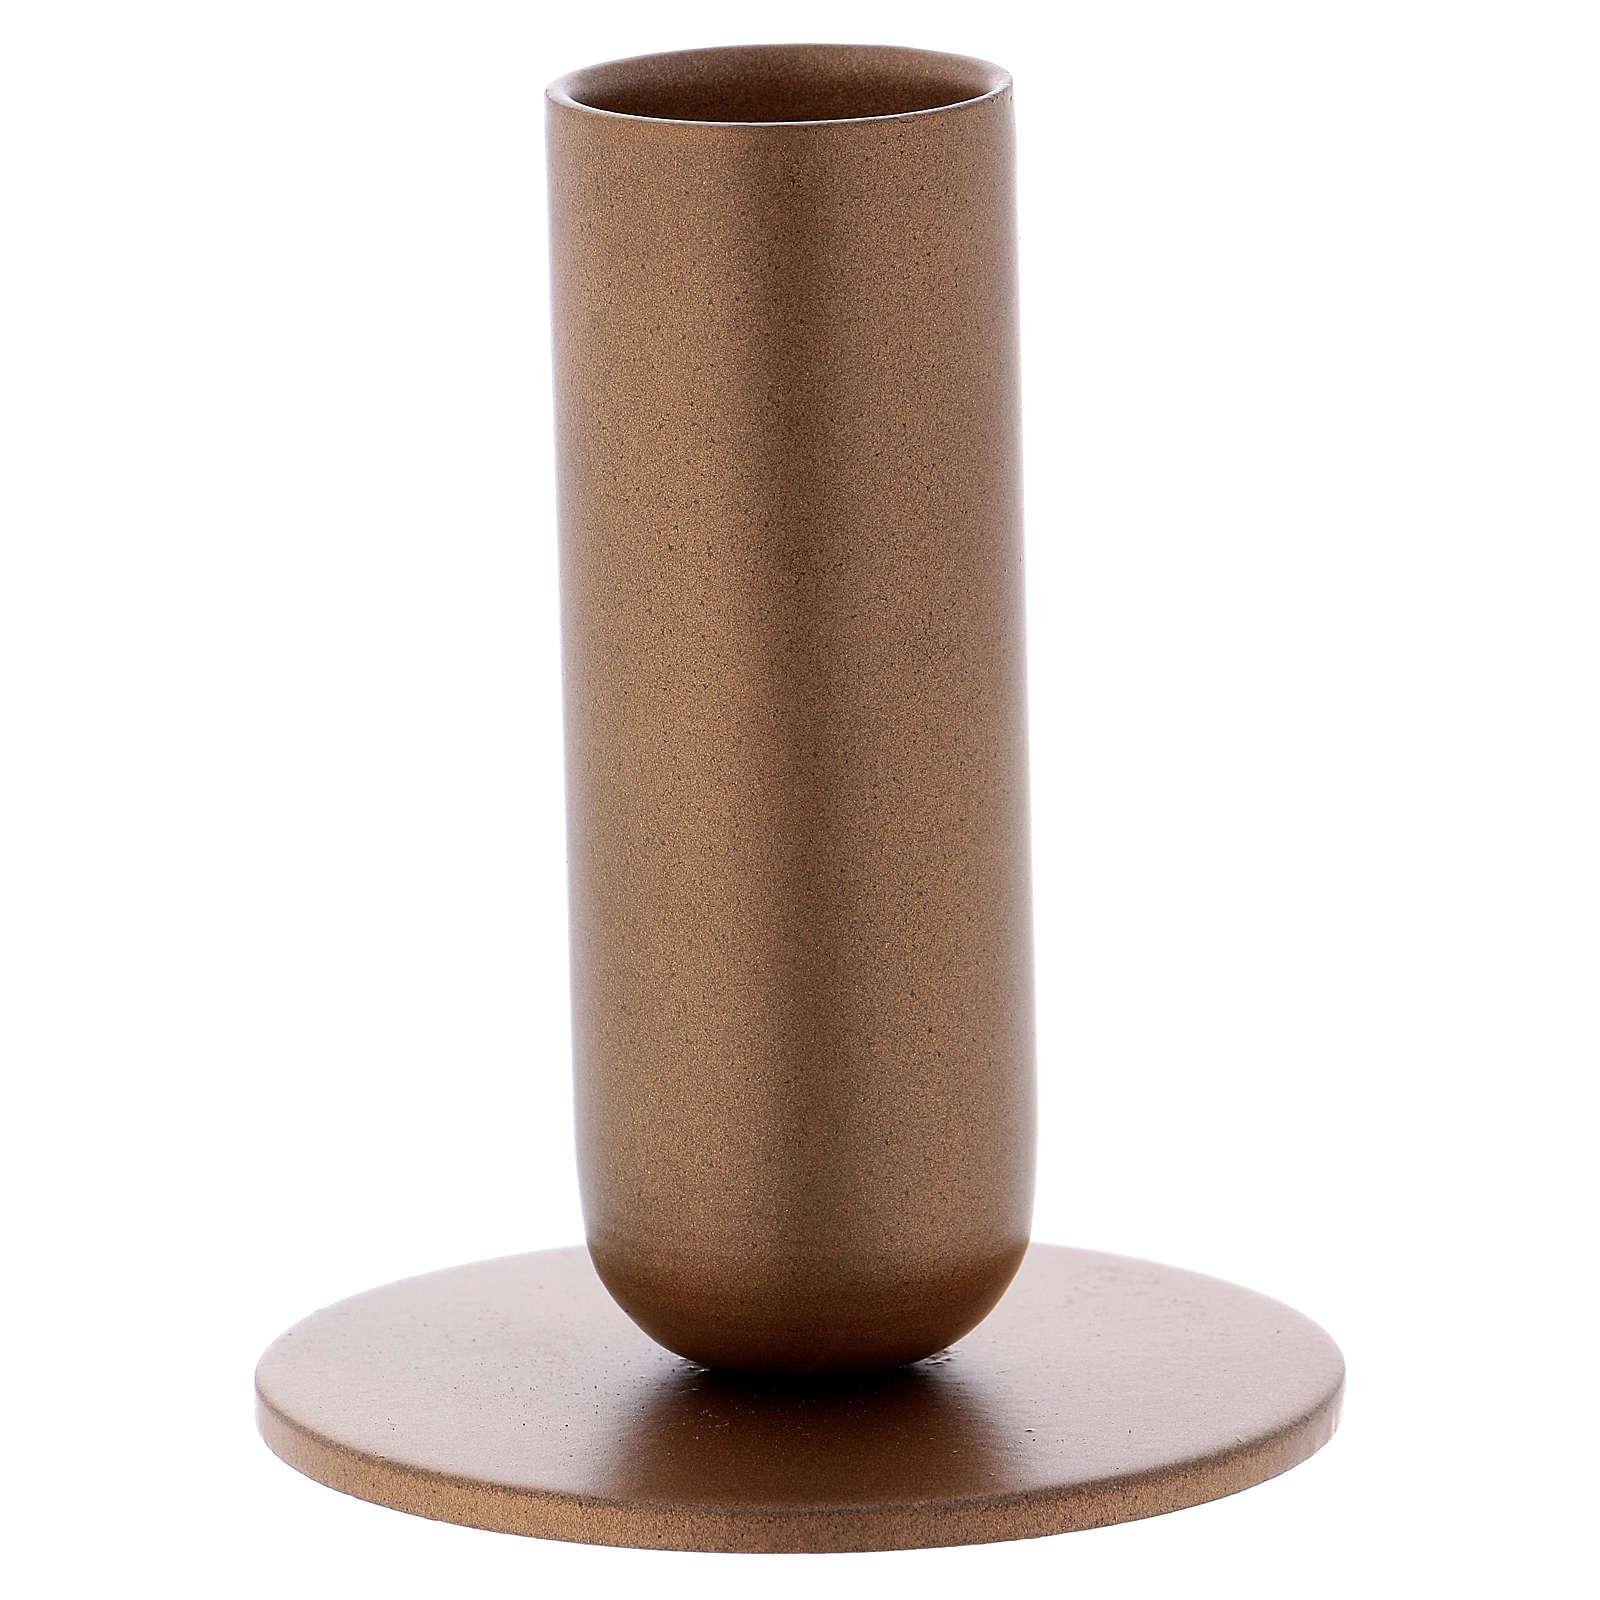 Portacandela tubolare ferro dorato 3